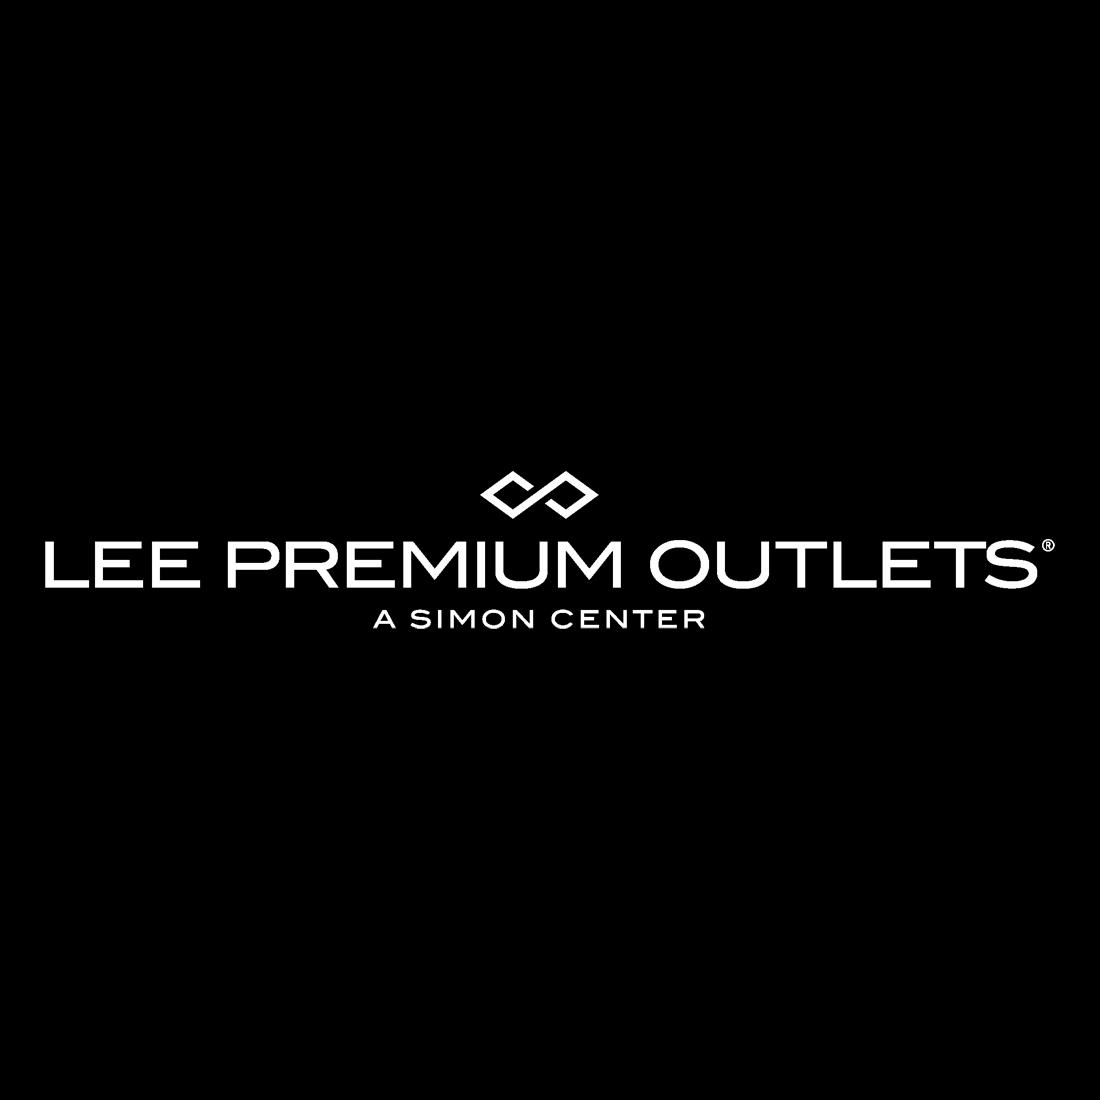 Lee Premium Outlets image 20